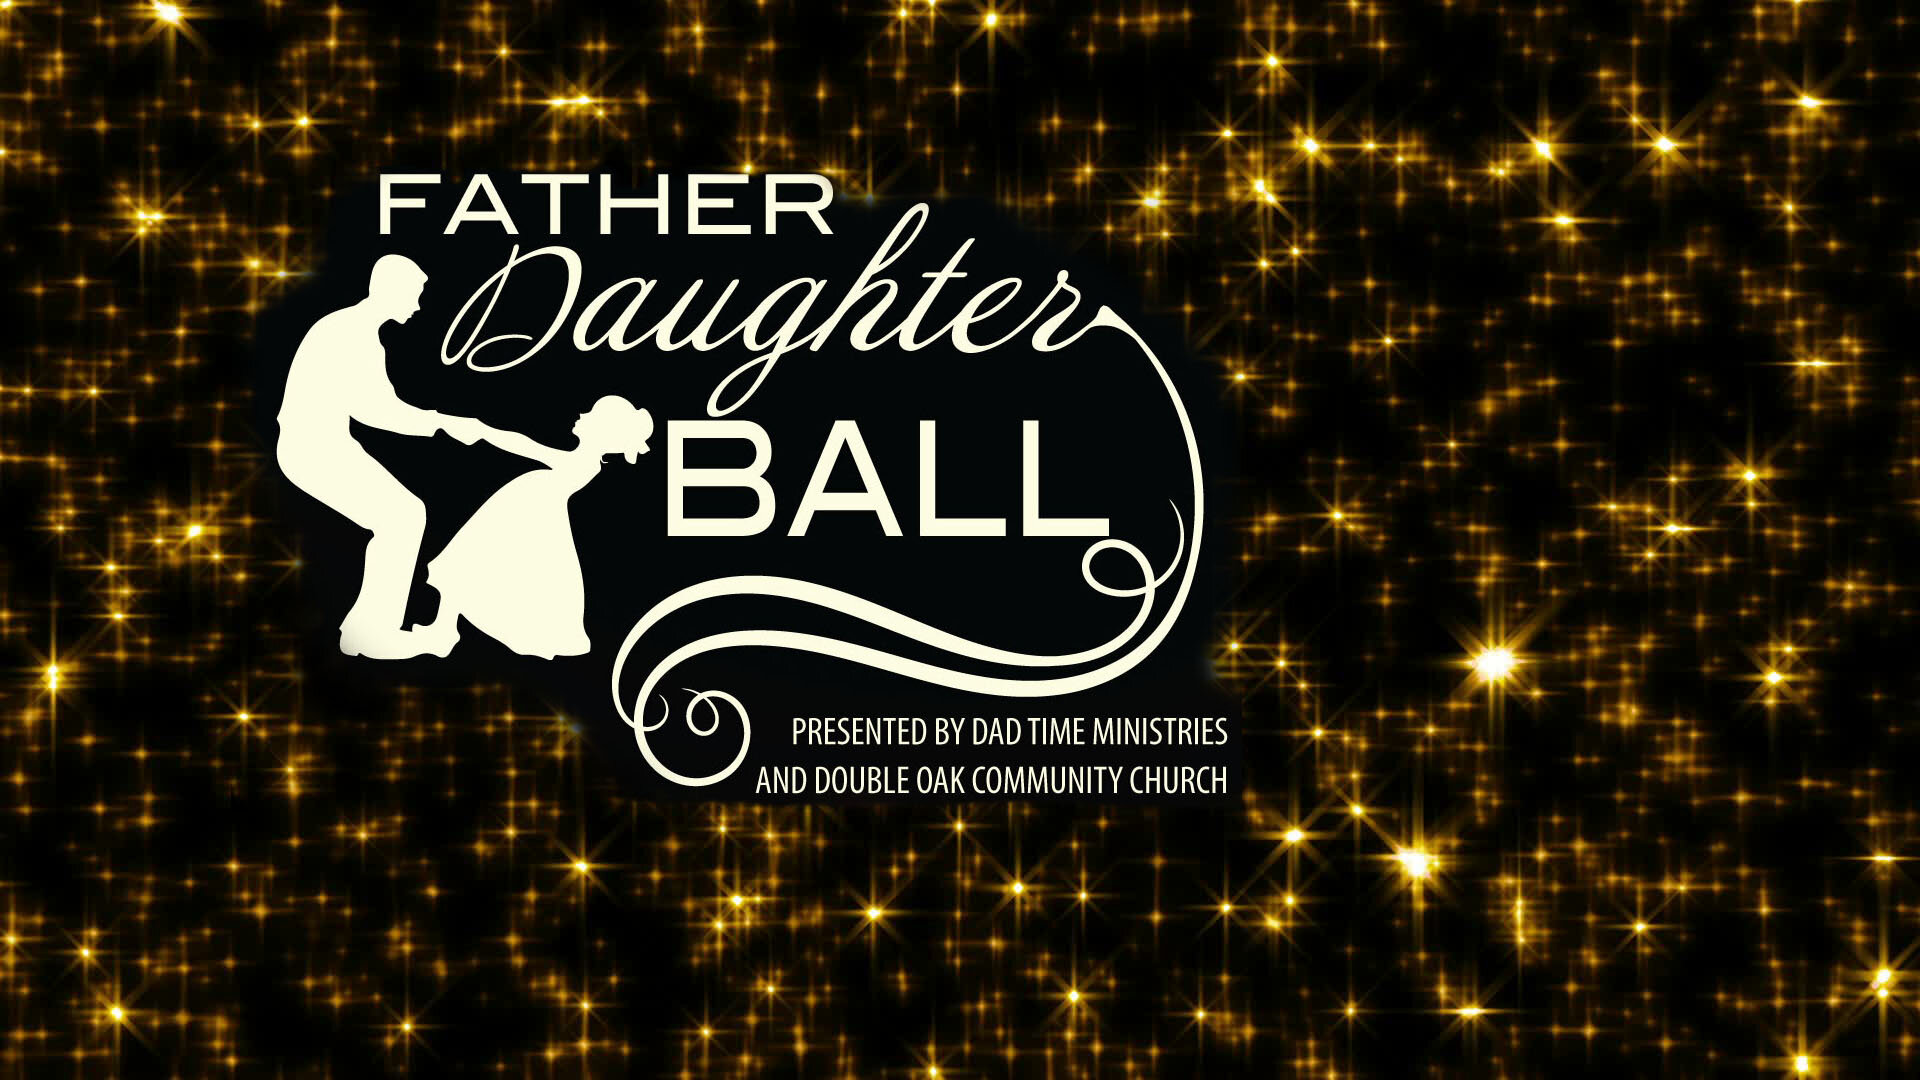 fatherdaughterblank.jpg